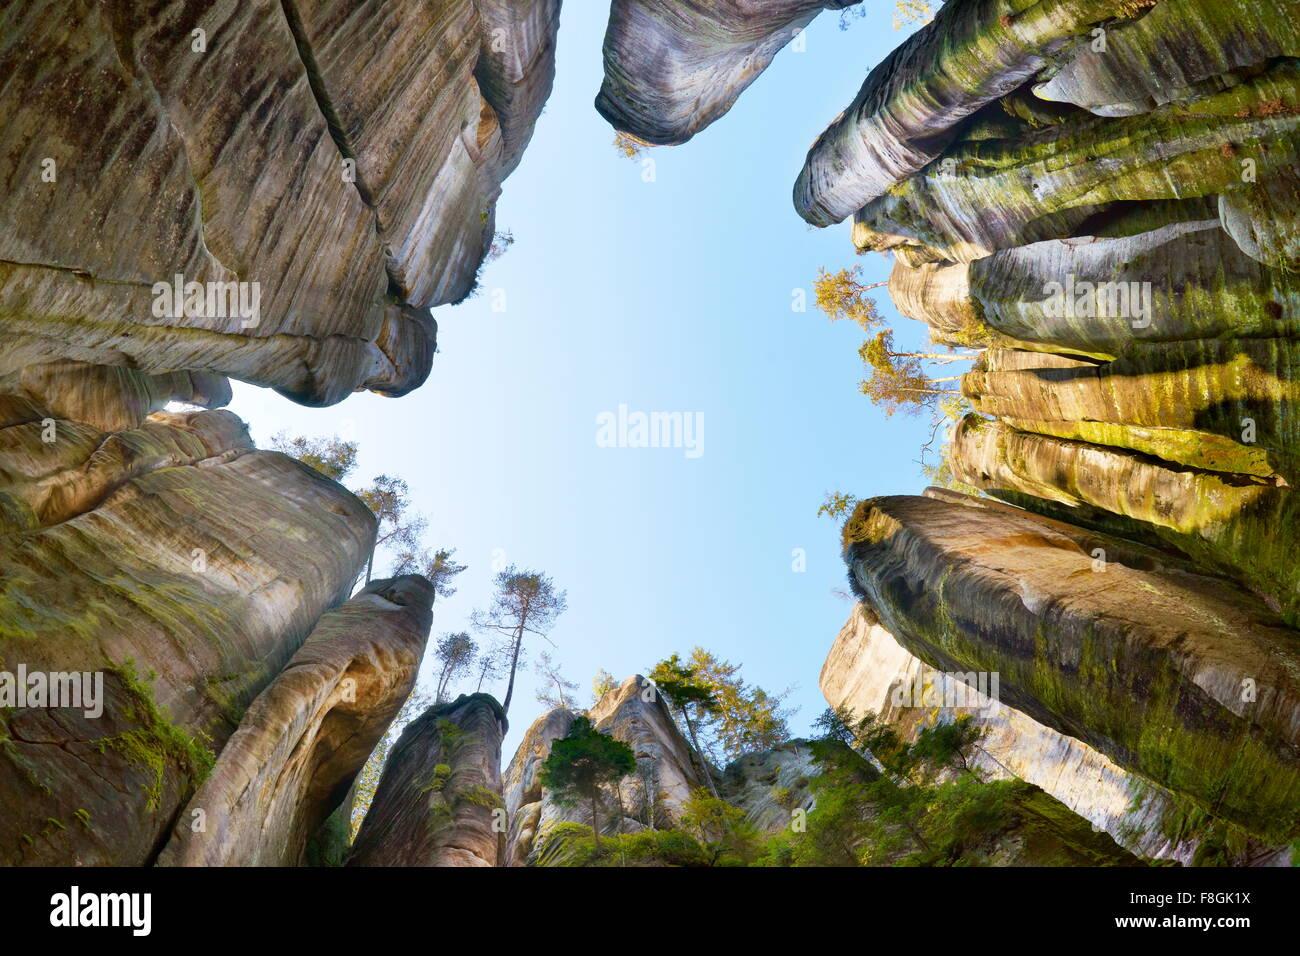 Adrspach Rock, Teplicke Rocks, Czech Republic - Stock Image